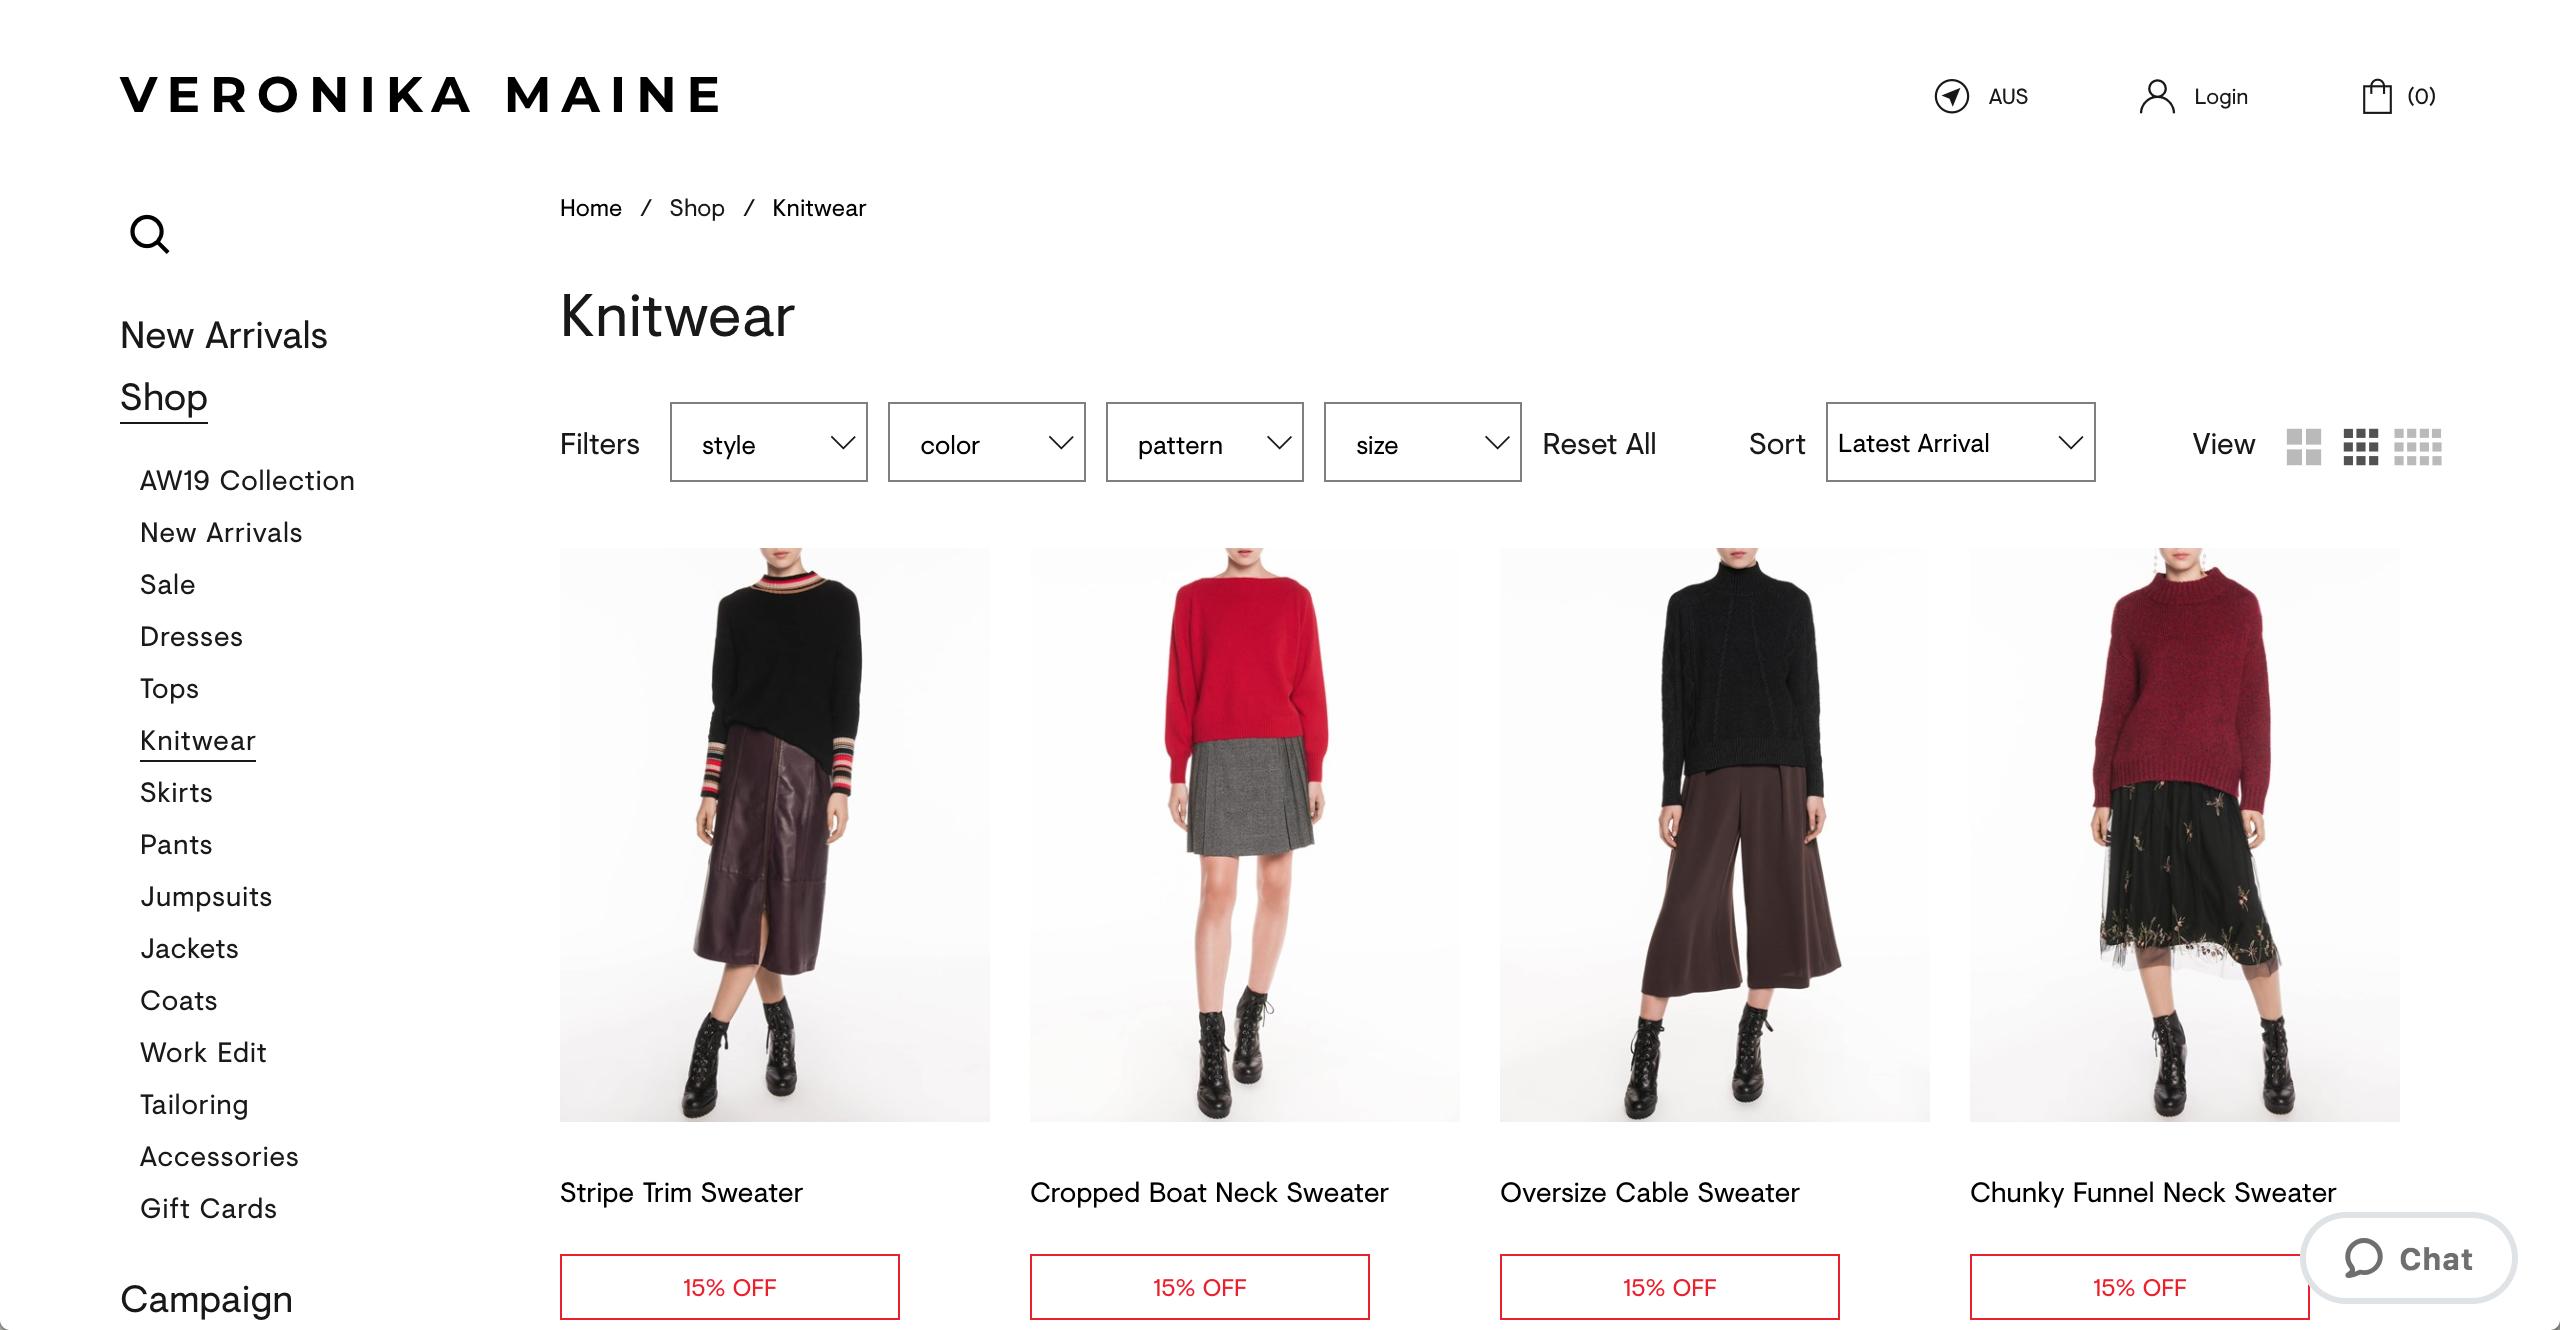 Veronika Maine knitwear